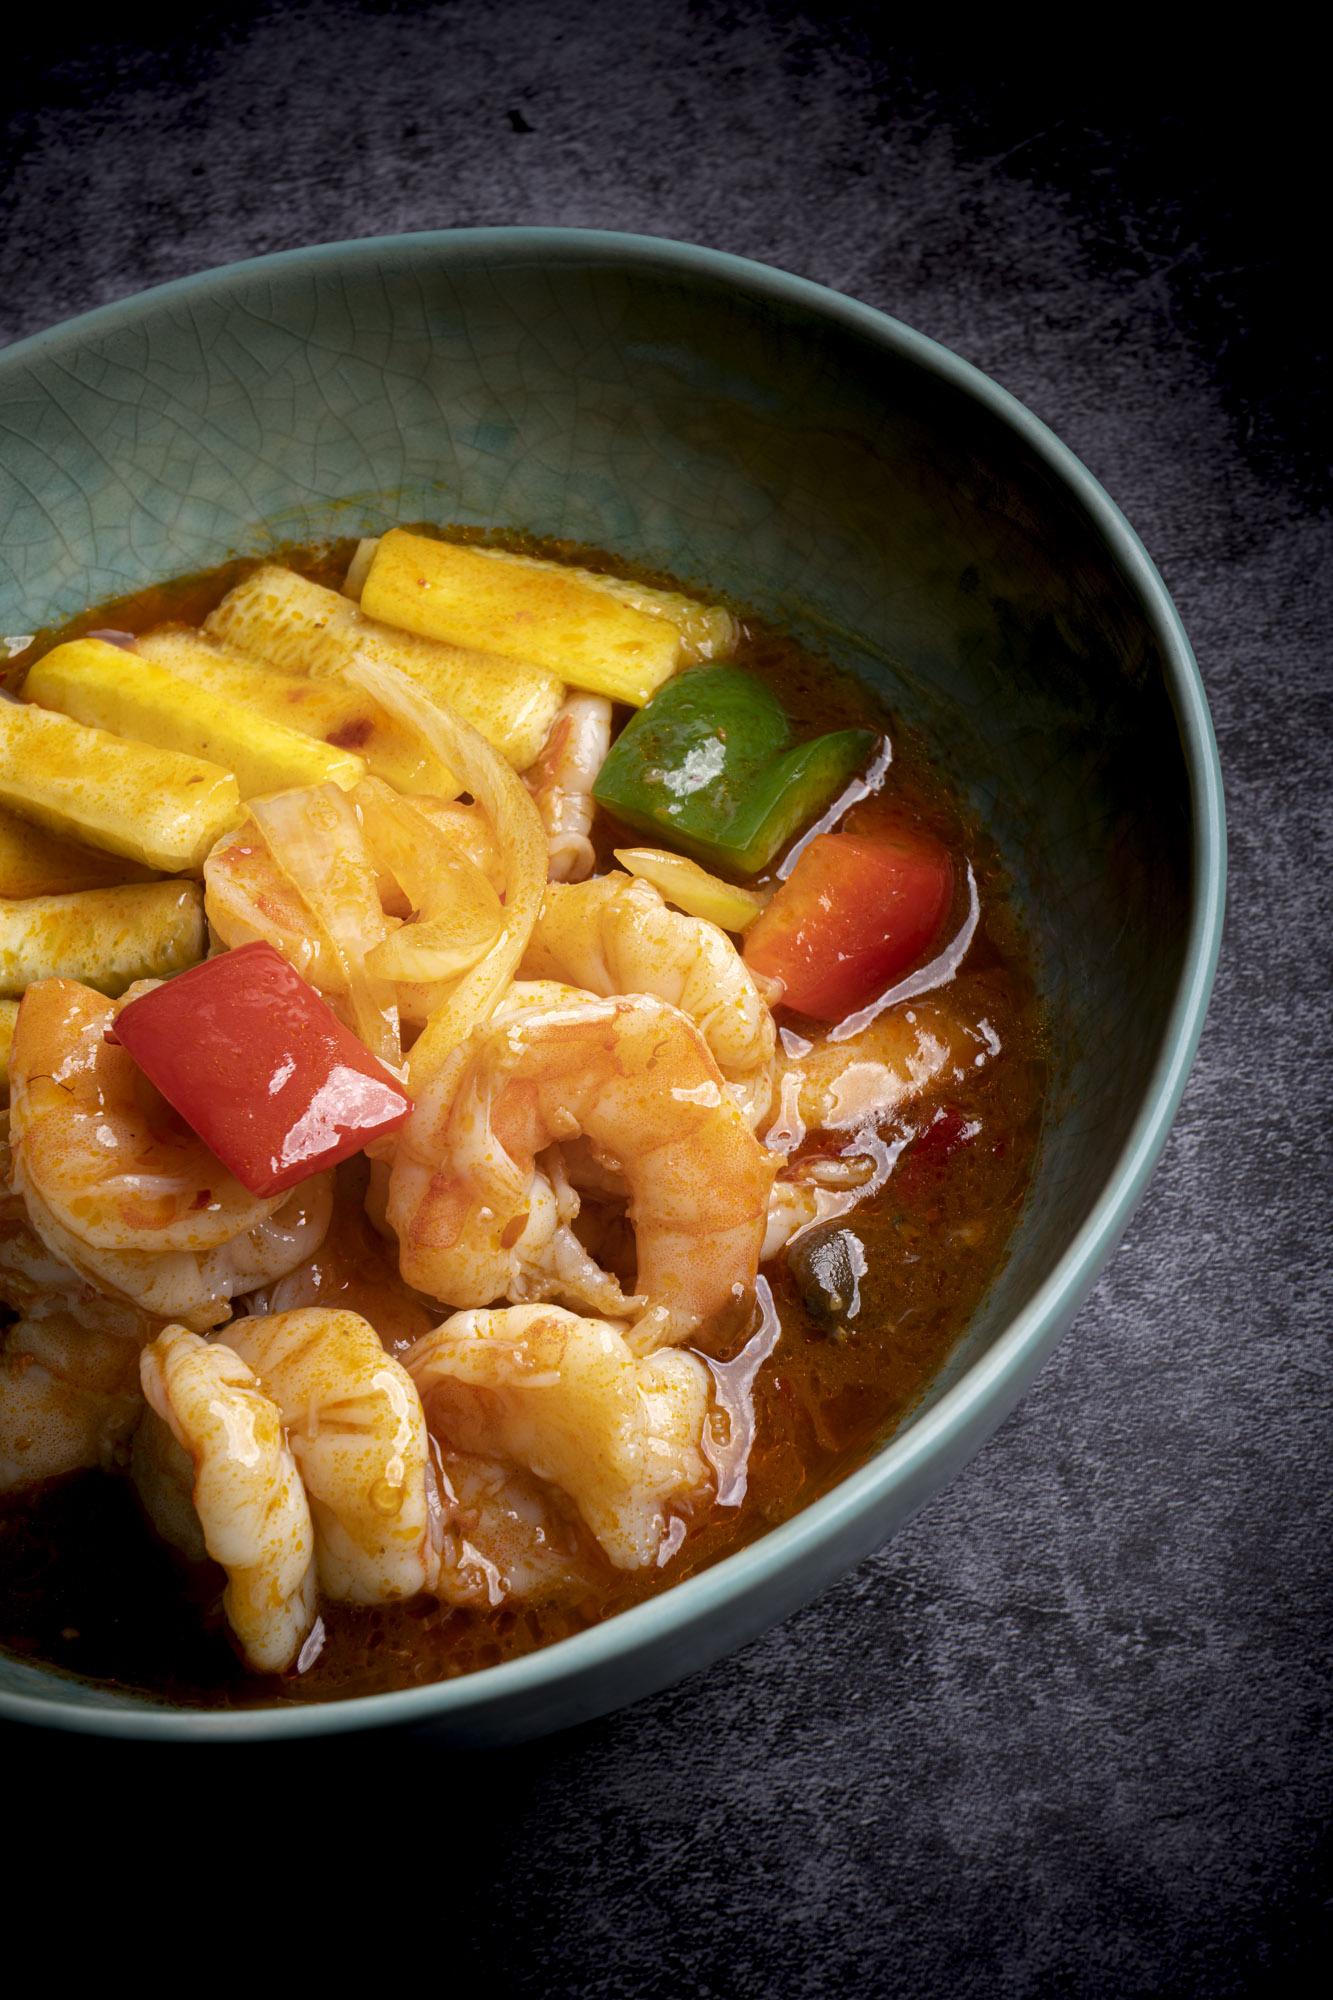 香辣蝦球 | Crevettes du Chef (piquantes)